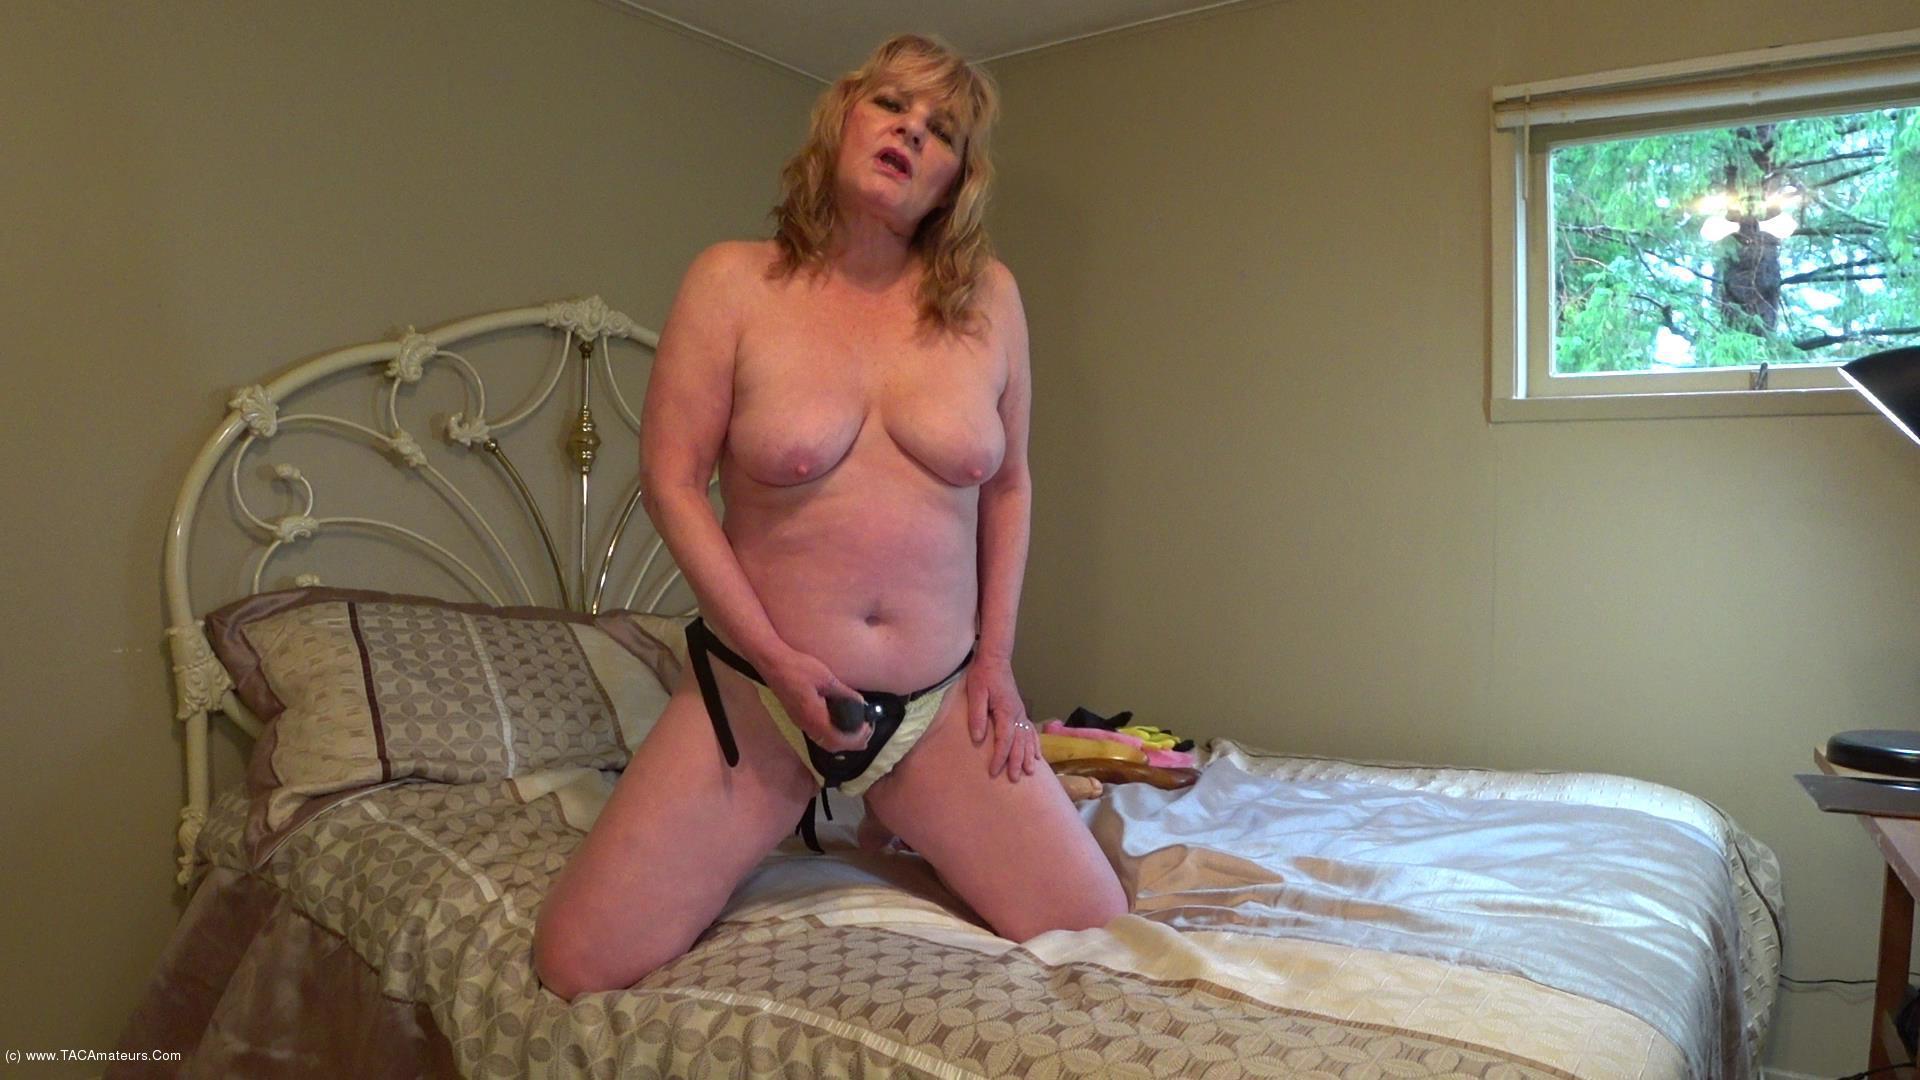 CougarBabeJolee - Sissy Boy Strap-on scene 1